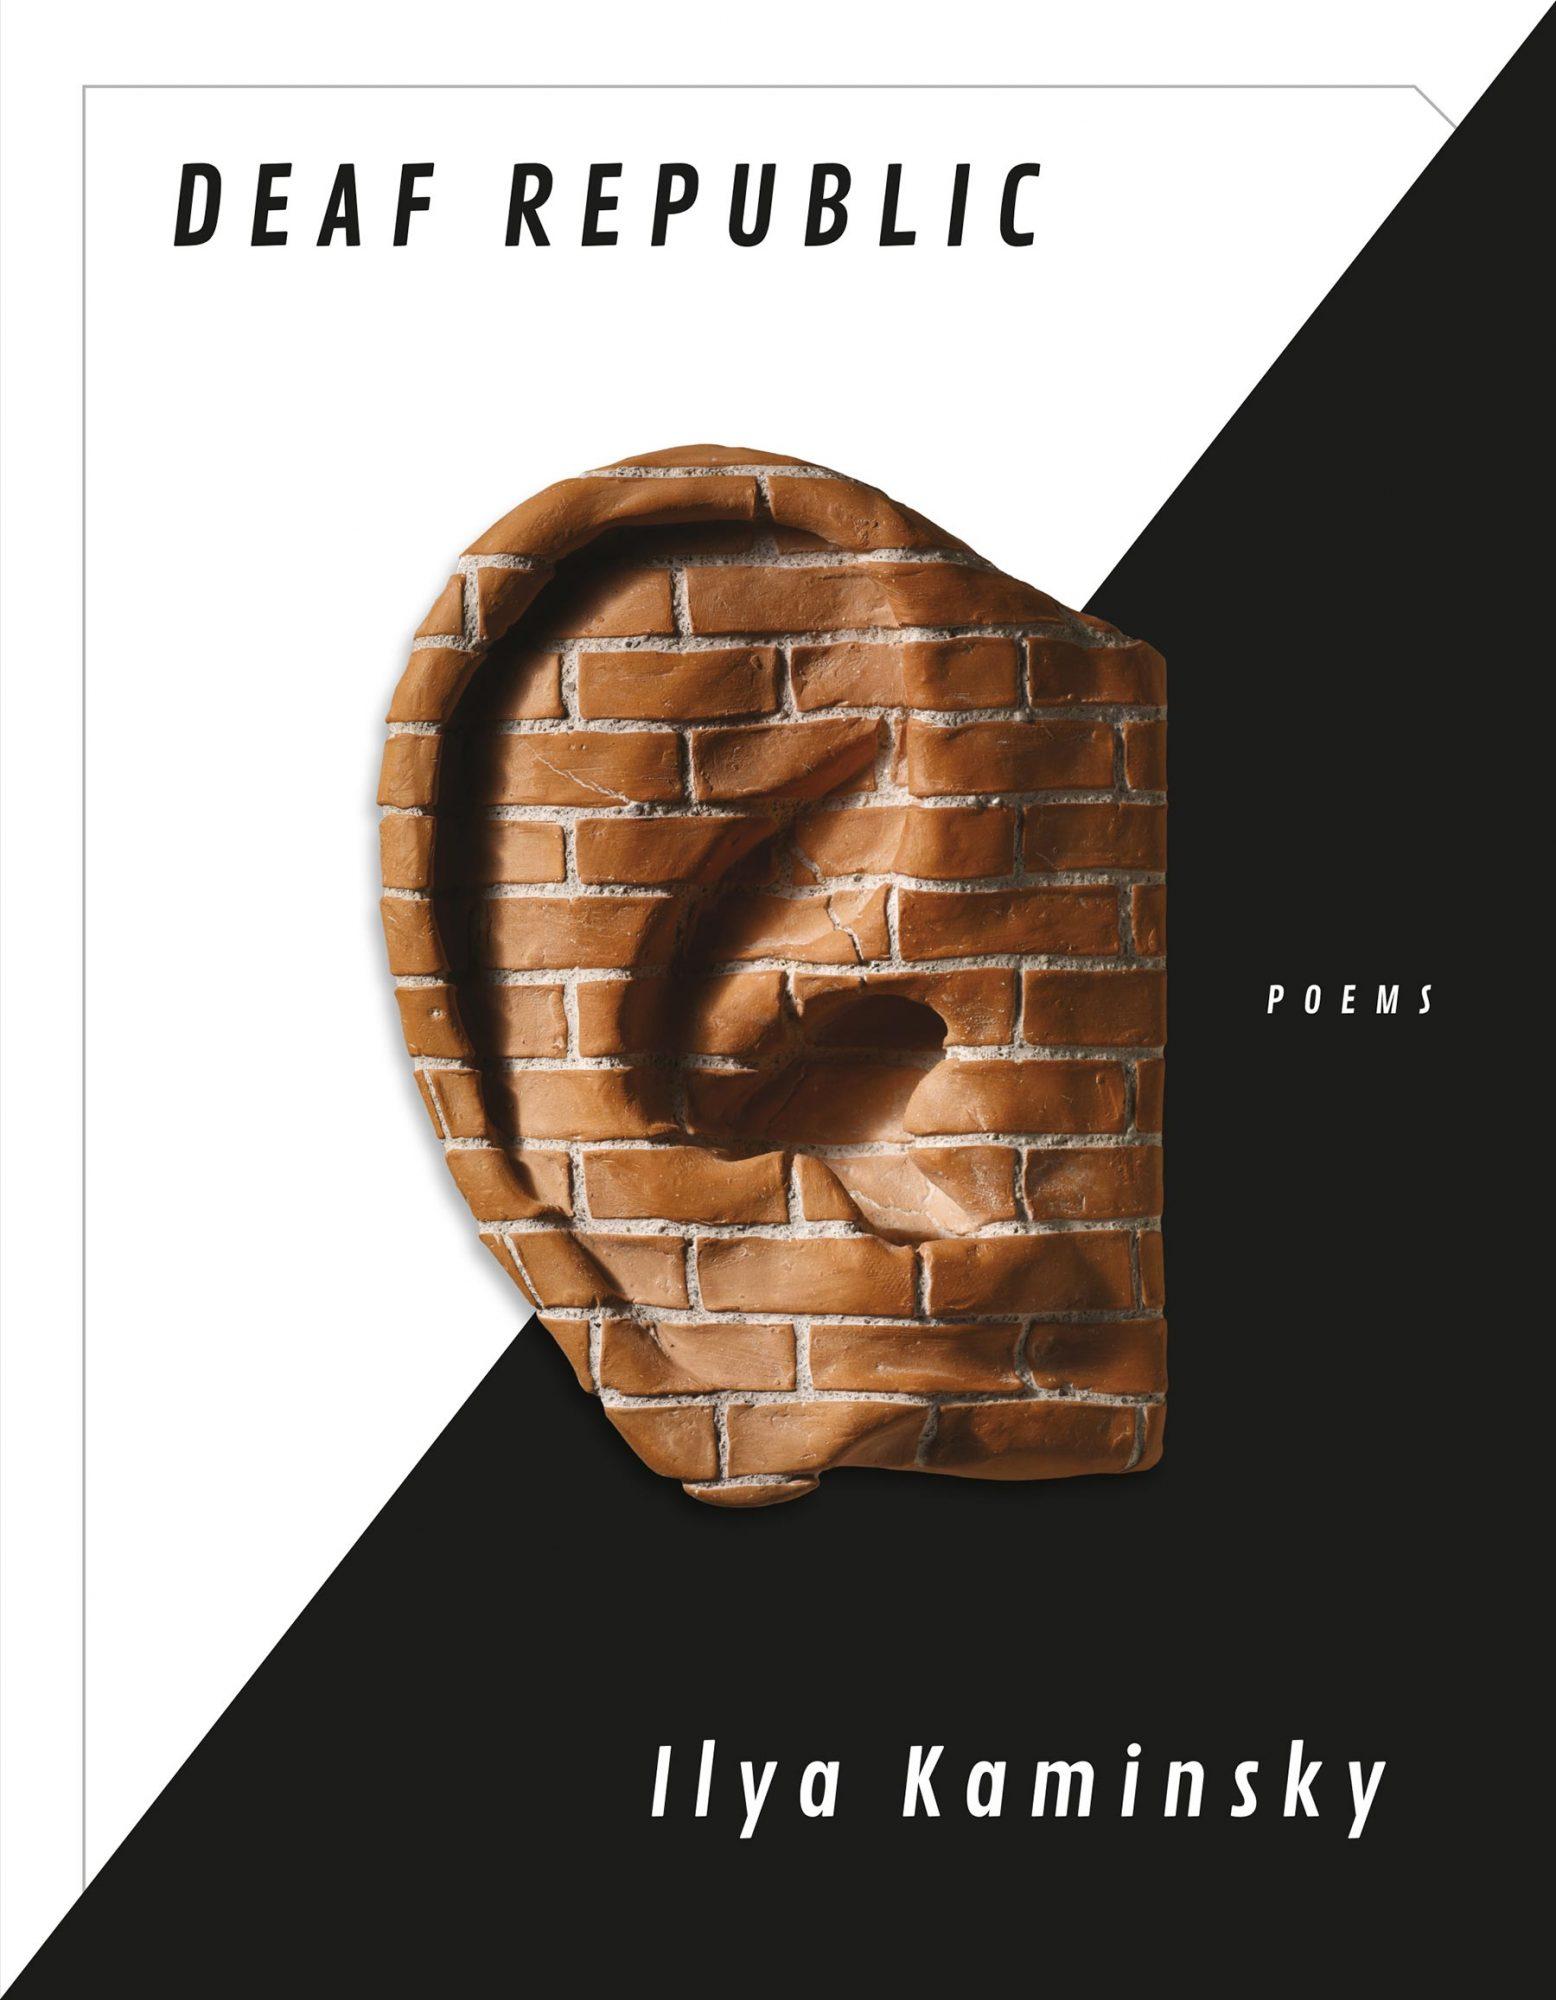 Deaf Republic by ILYA KAMINSKYPublisher: Graywolf Pres